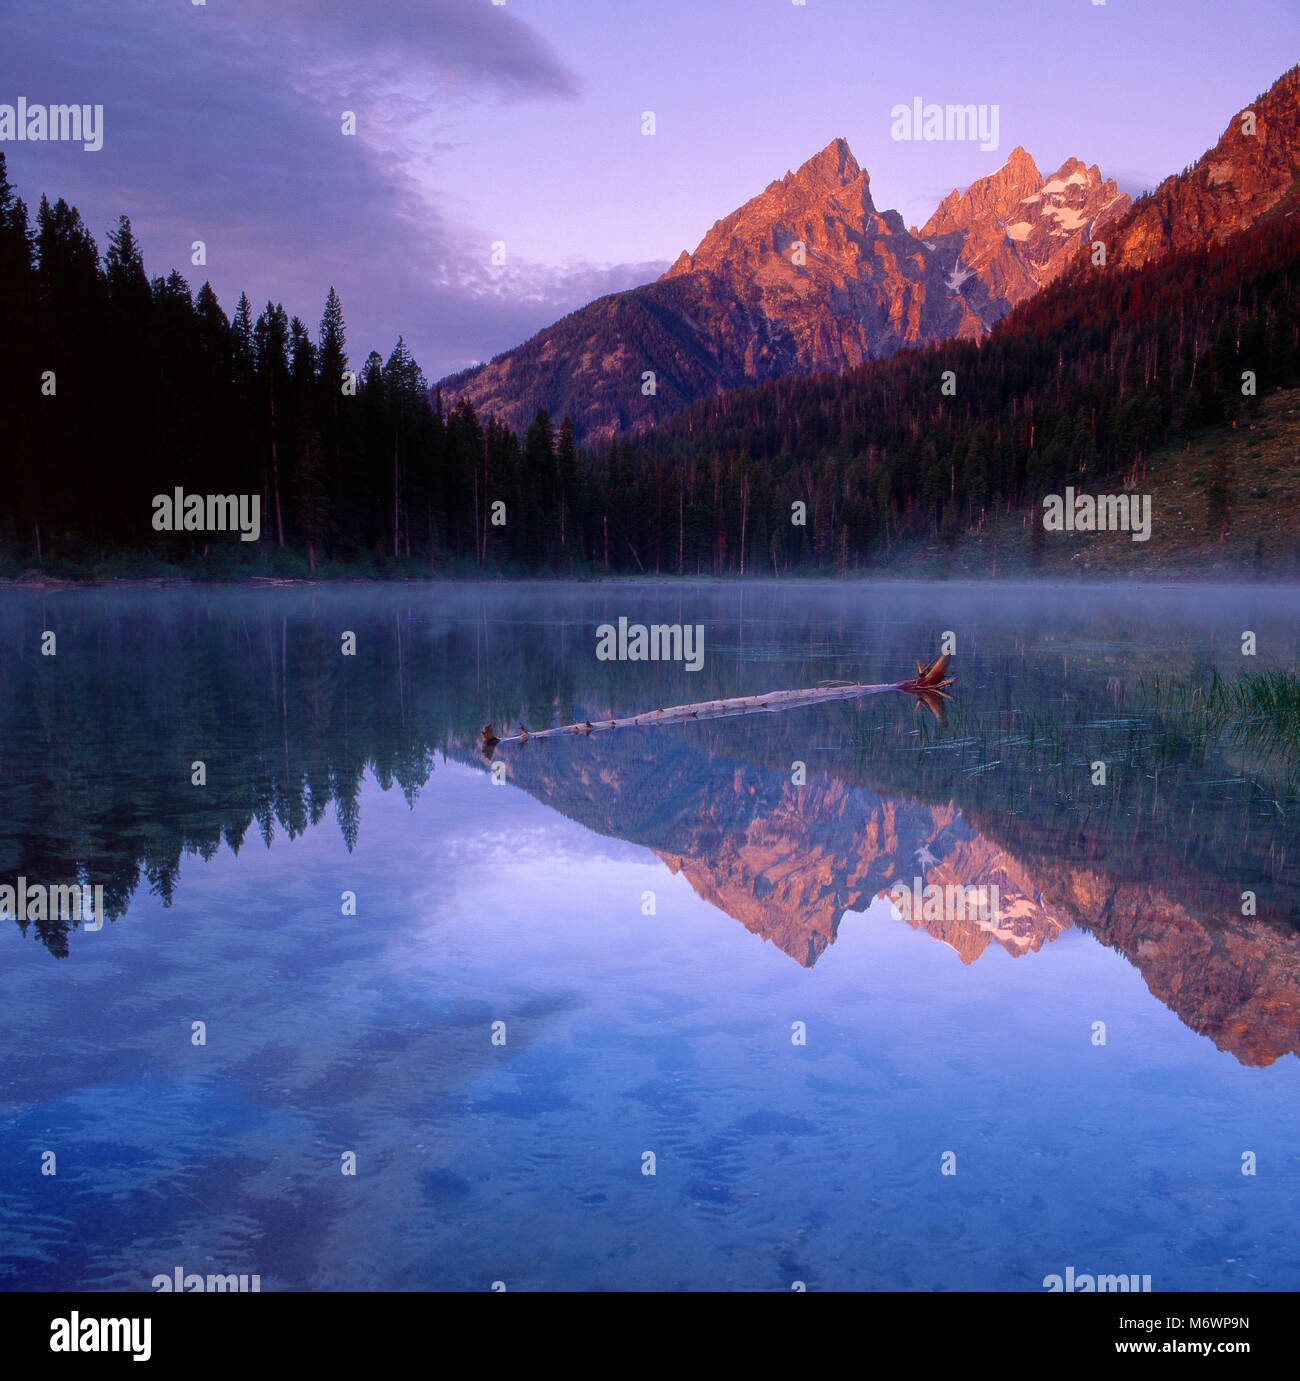 Sunrise, String Lake, The Cathedrals, Grand Teton National Park, Wyoming - Stock Image